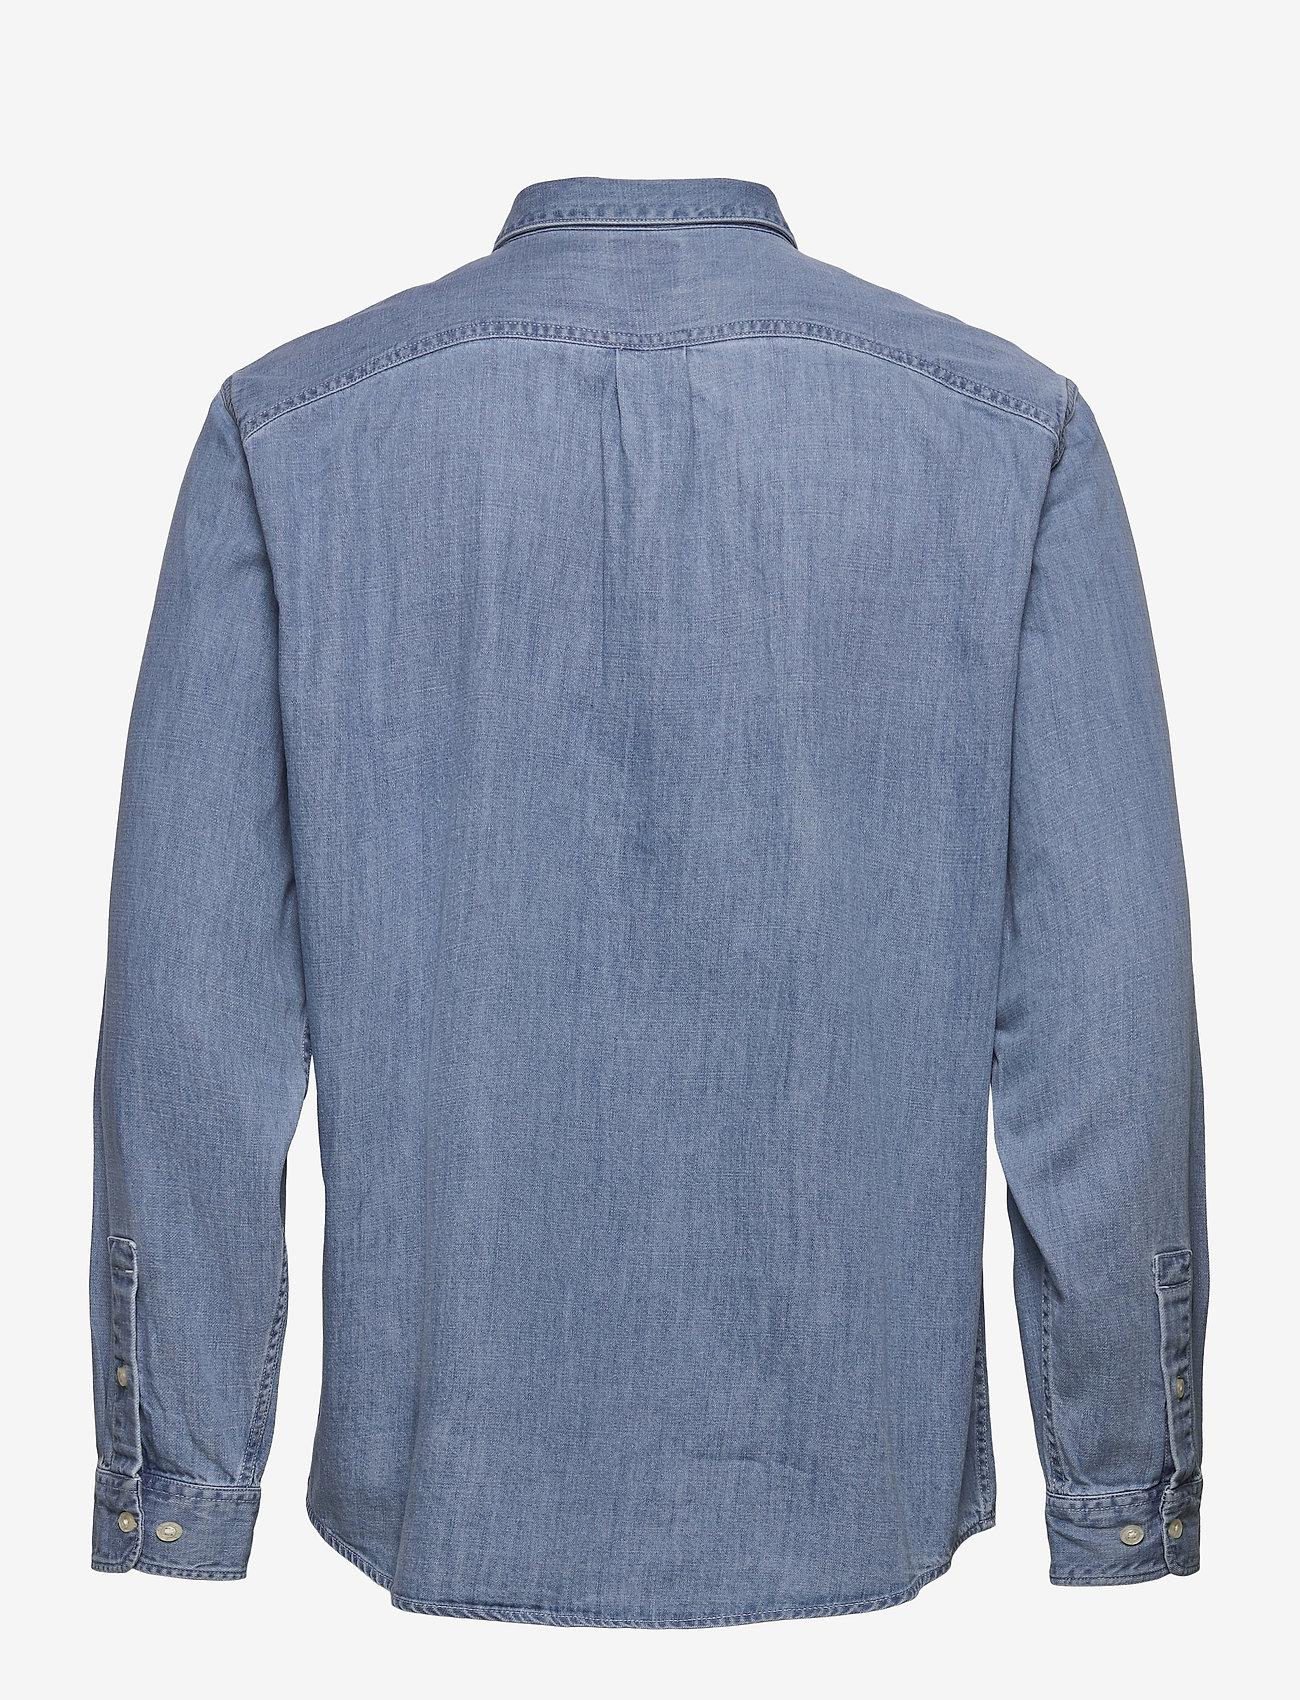 Lee Jeans - RIVETED SHIRT - denim shirts - frost blue - 1